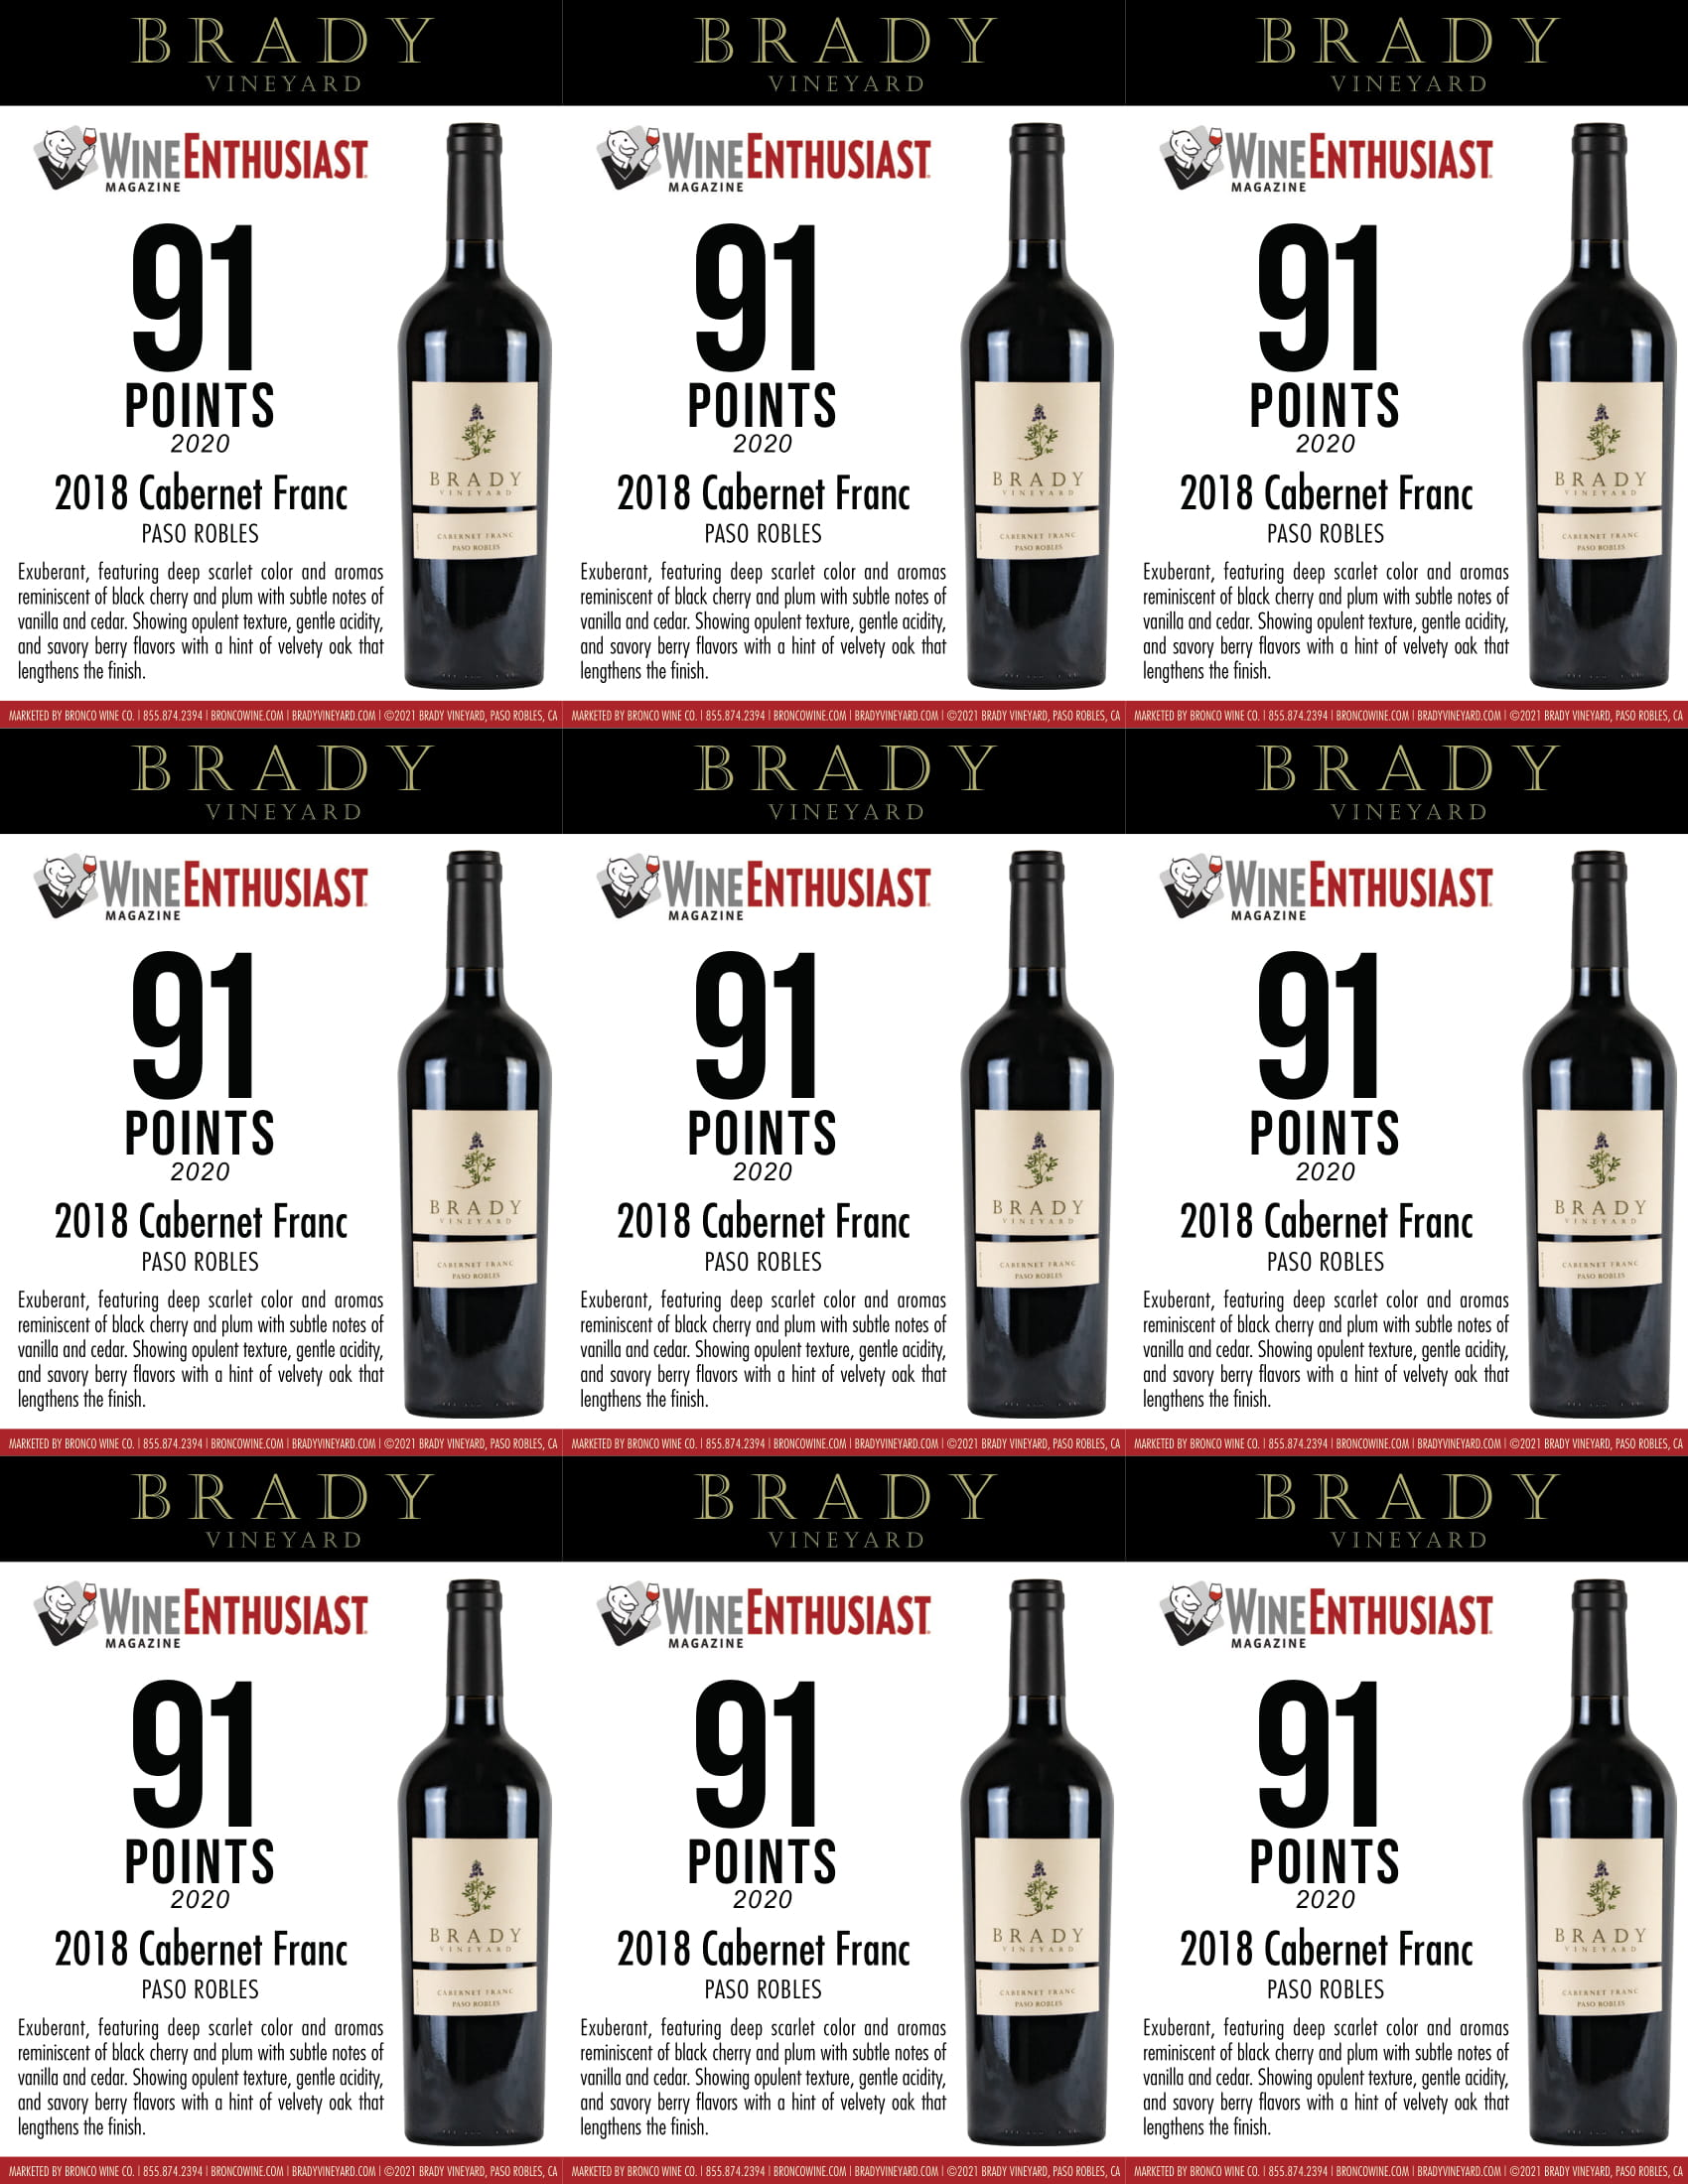 Brady Vineyards Cabernet Franc Shelf Talkers